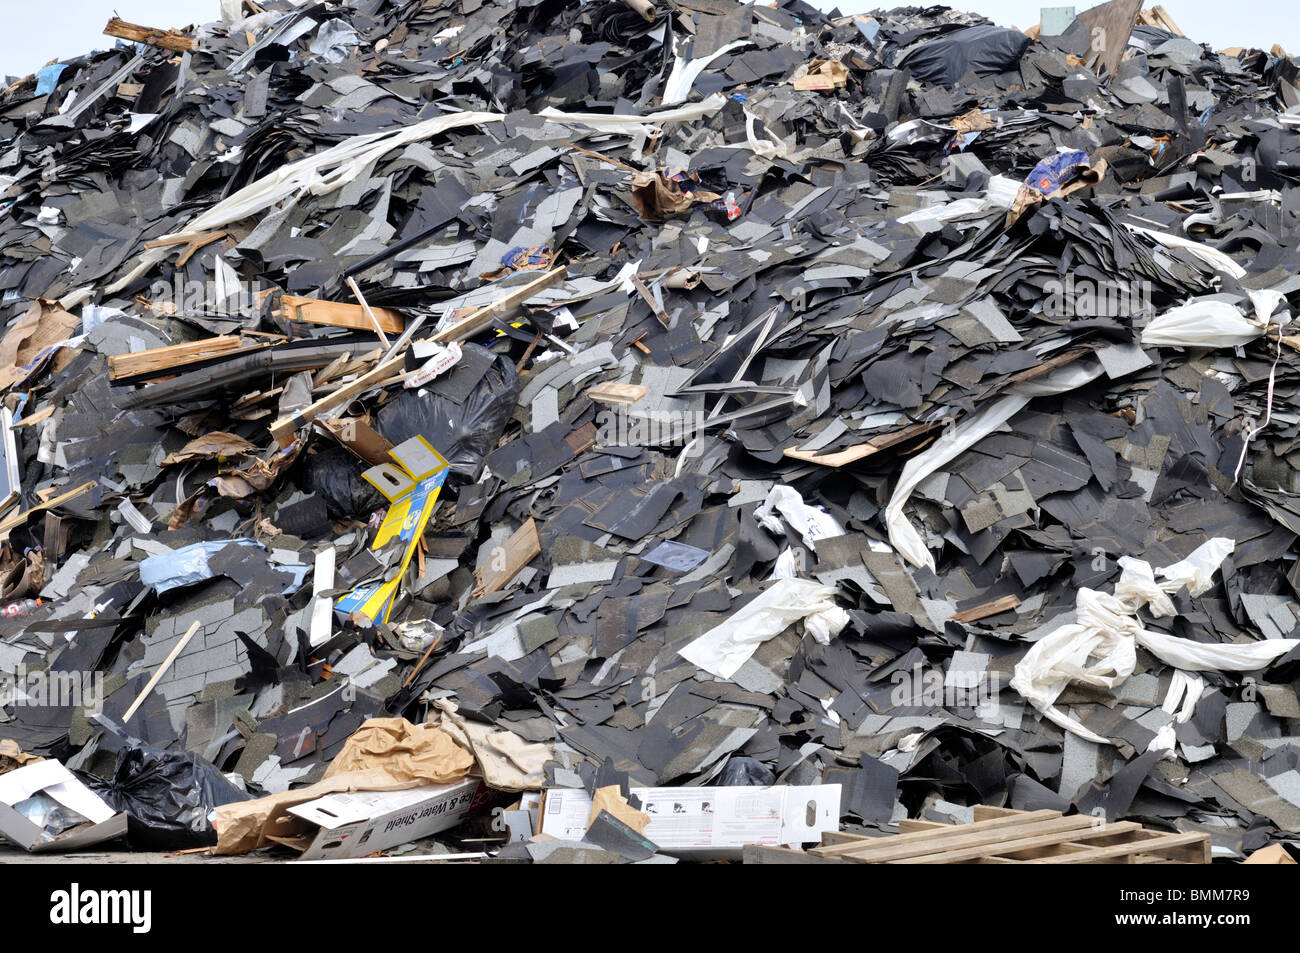 Big pile of asphalt roofing shingles and trash at landfill - Stock Image